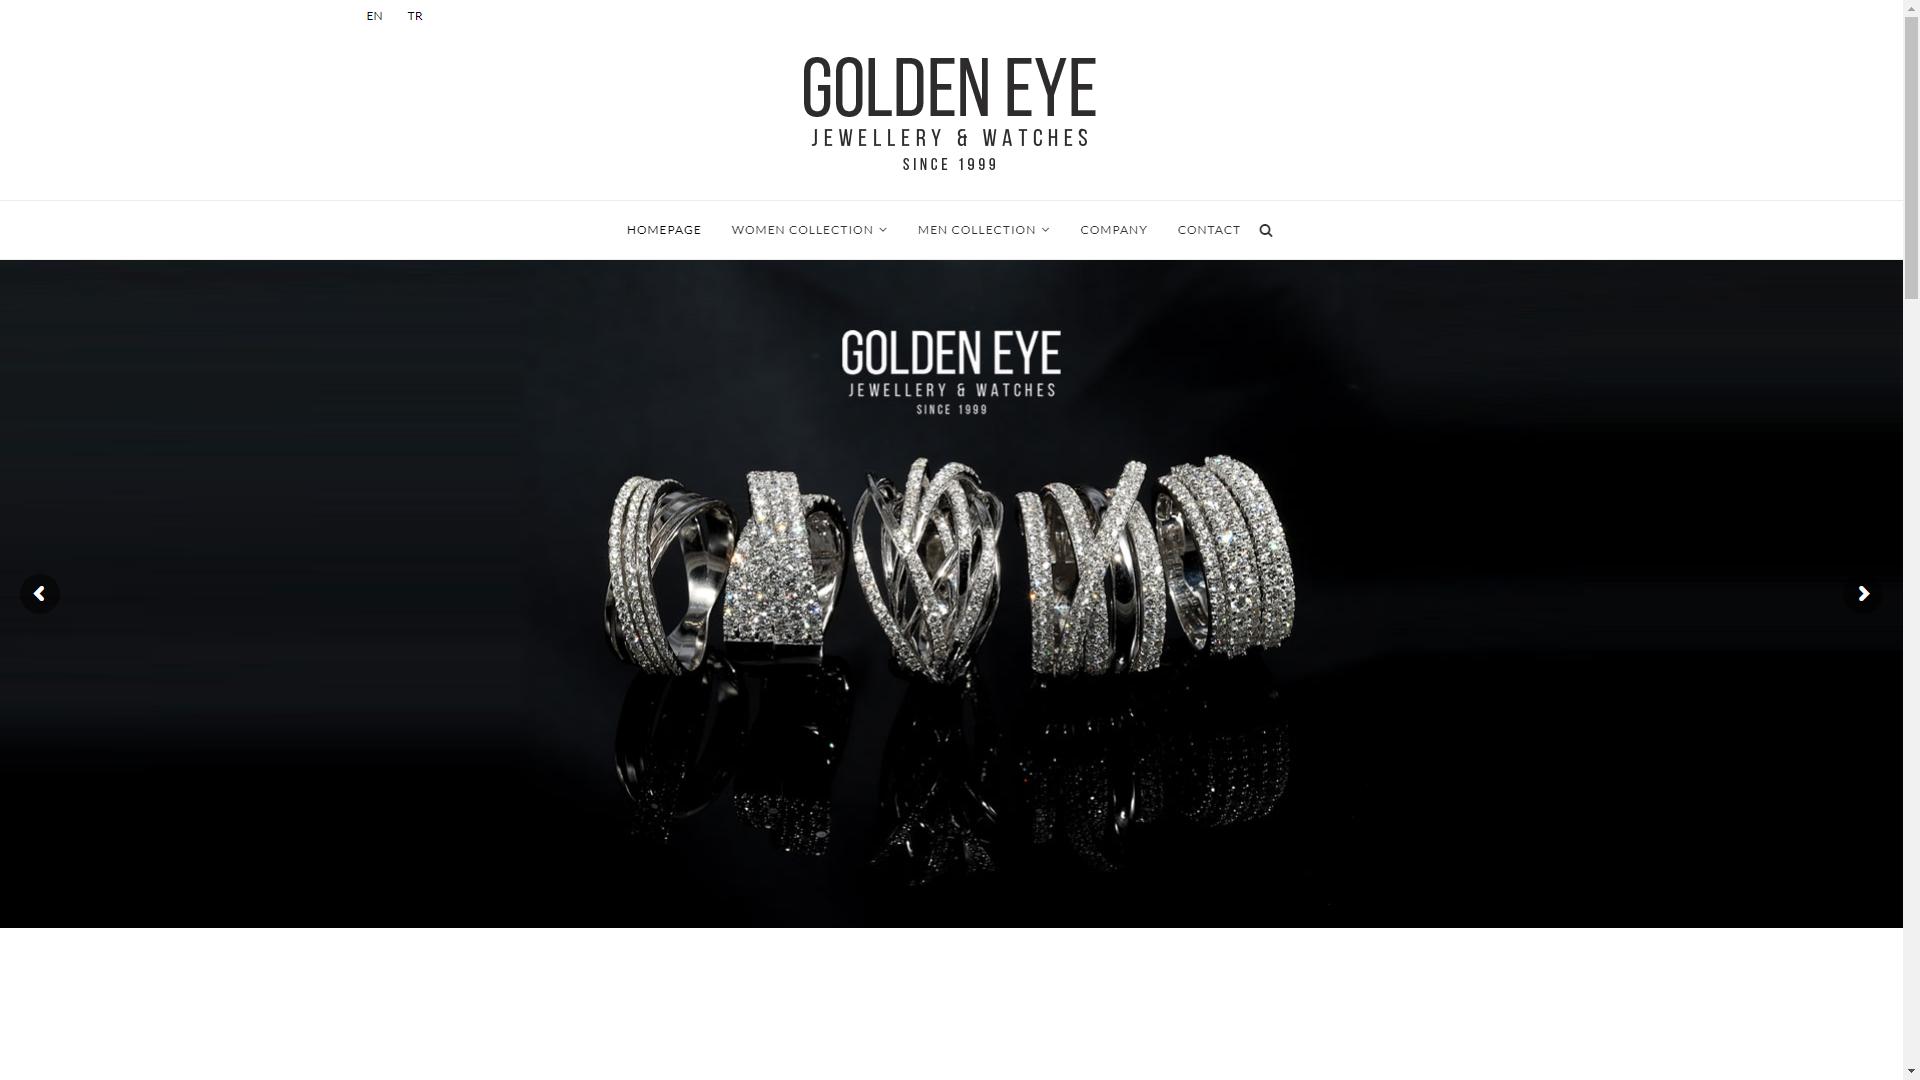 webfili-alanya-jewelry-shop-qoldan-eye-yenilendi-01.png